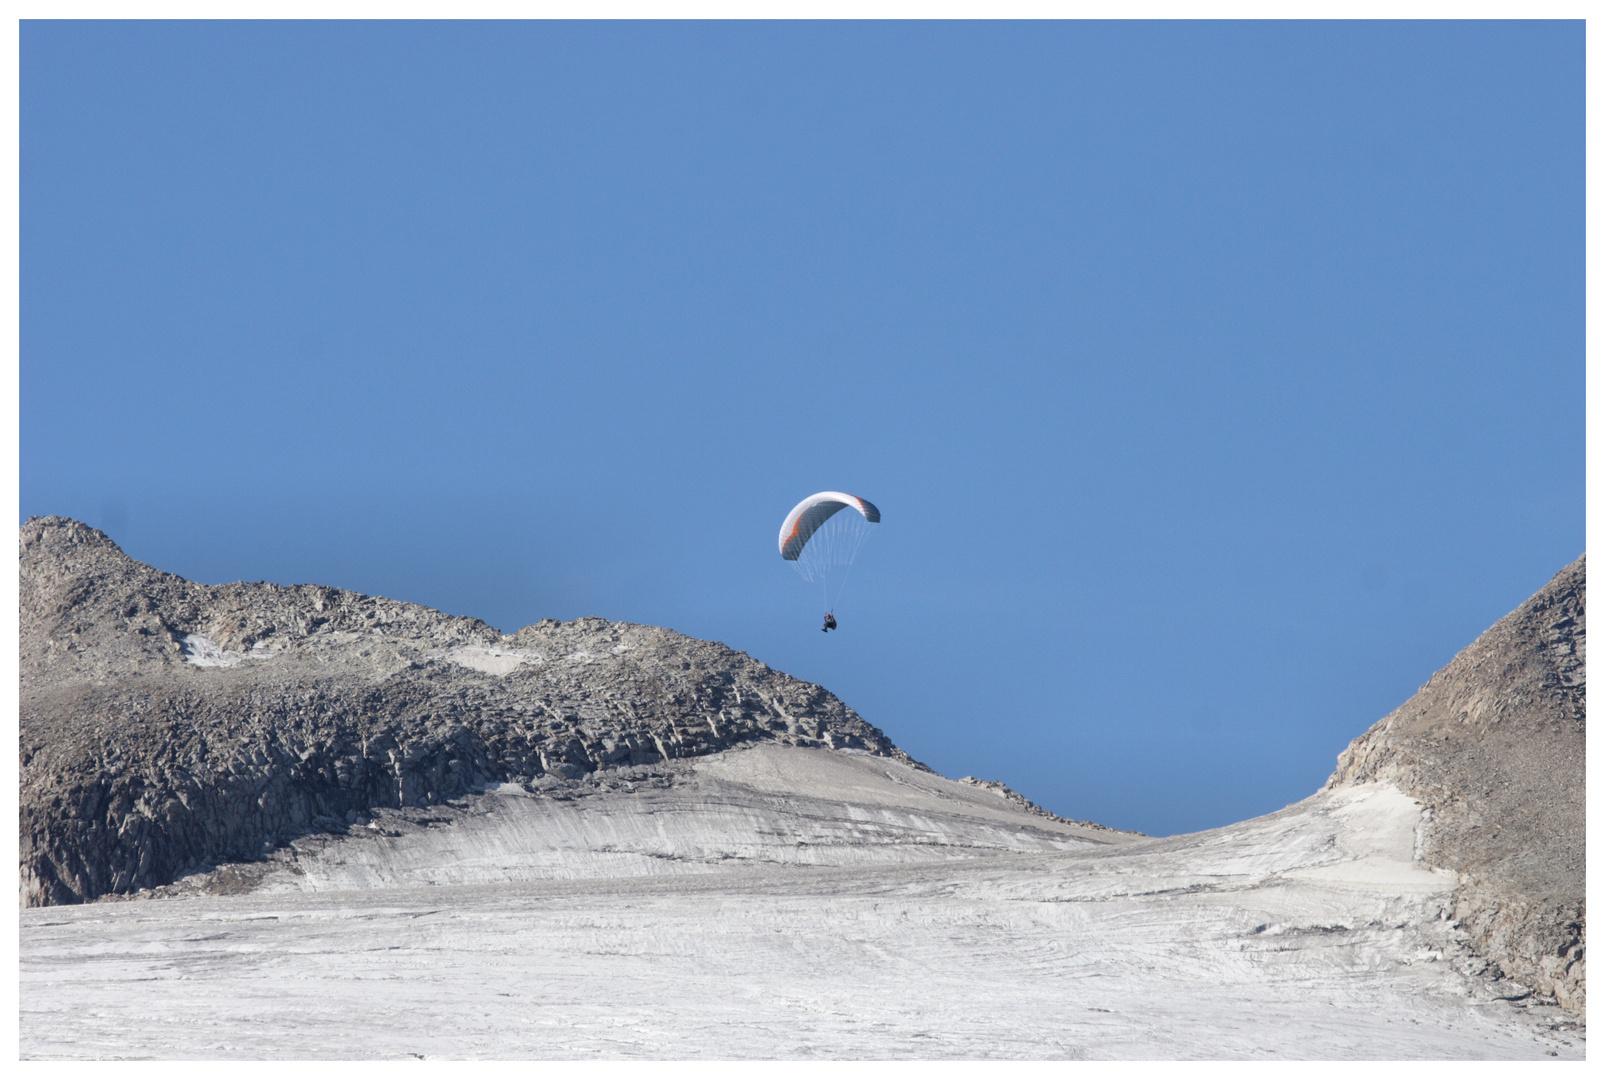 Tessin / Ticino Höhenflug